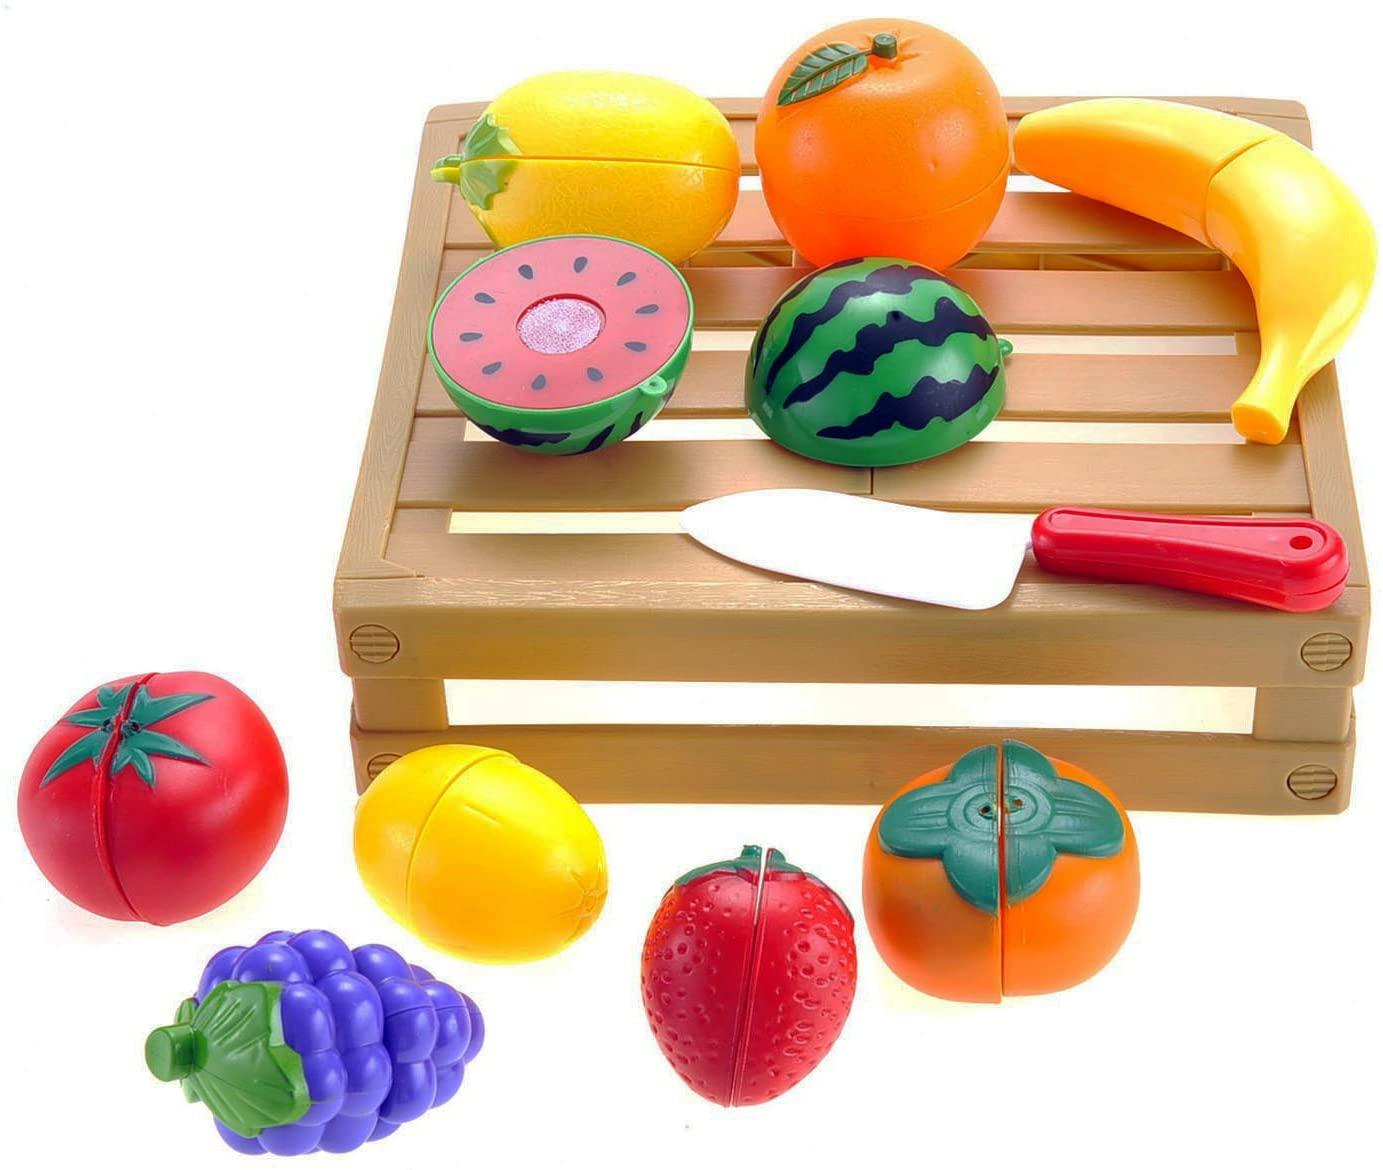 Liberty Imports 20 Pcs Kitchen Cutting Fruits Crate Pretend Food Playset